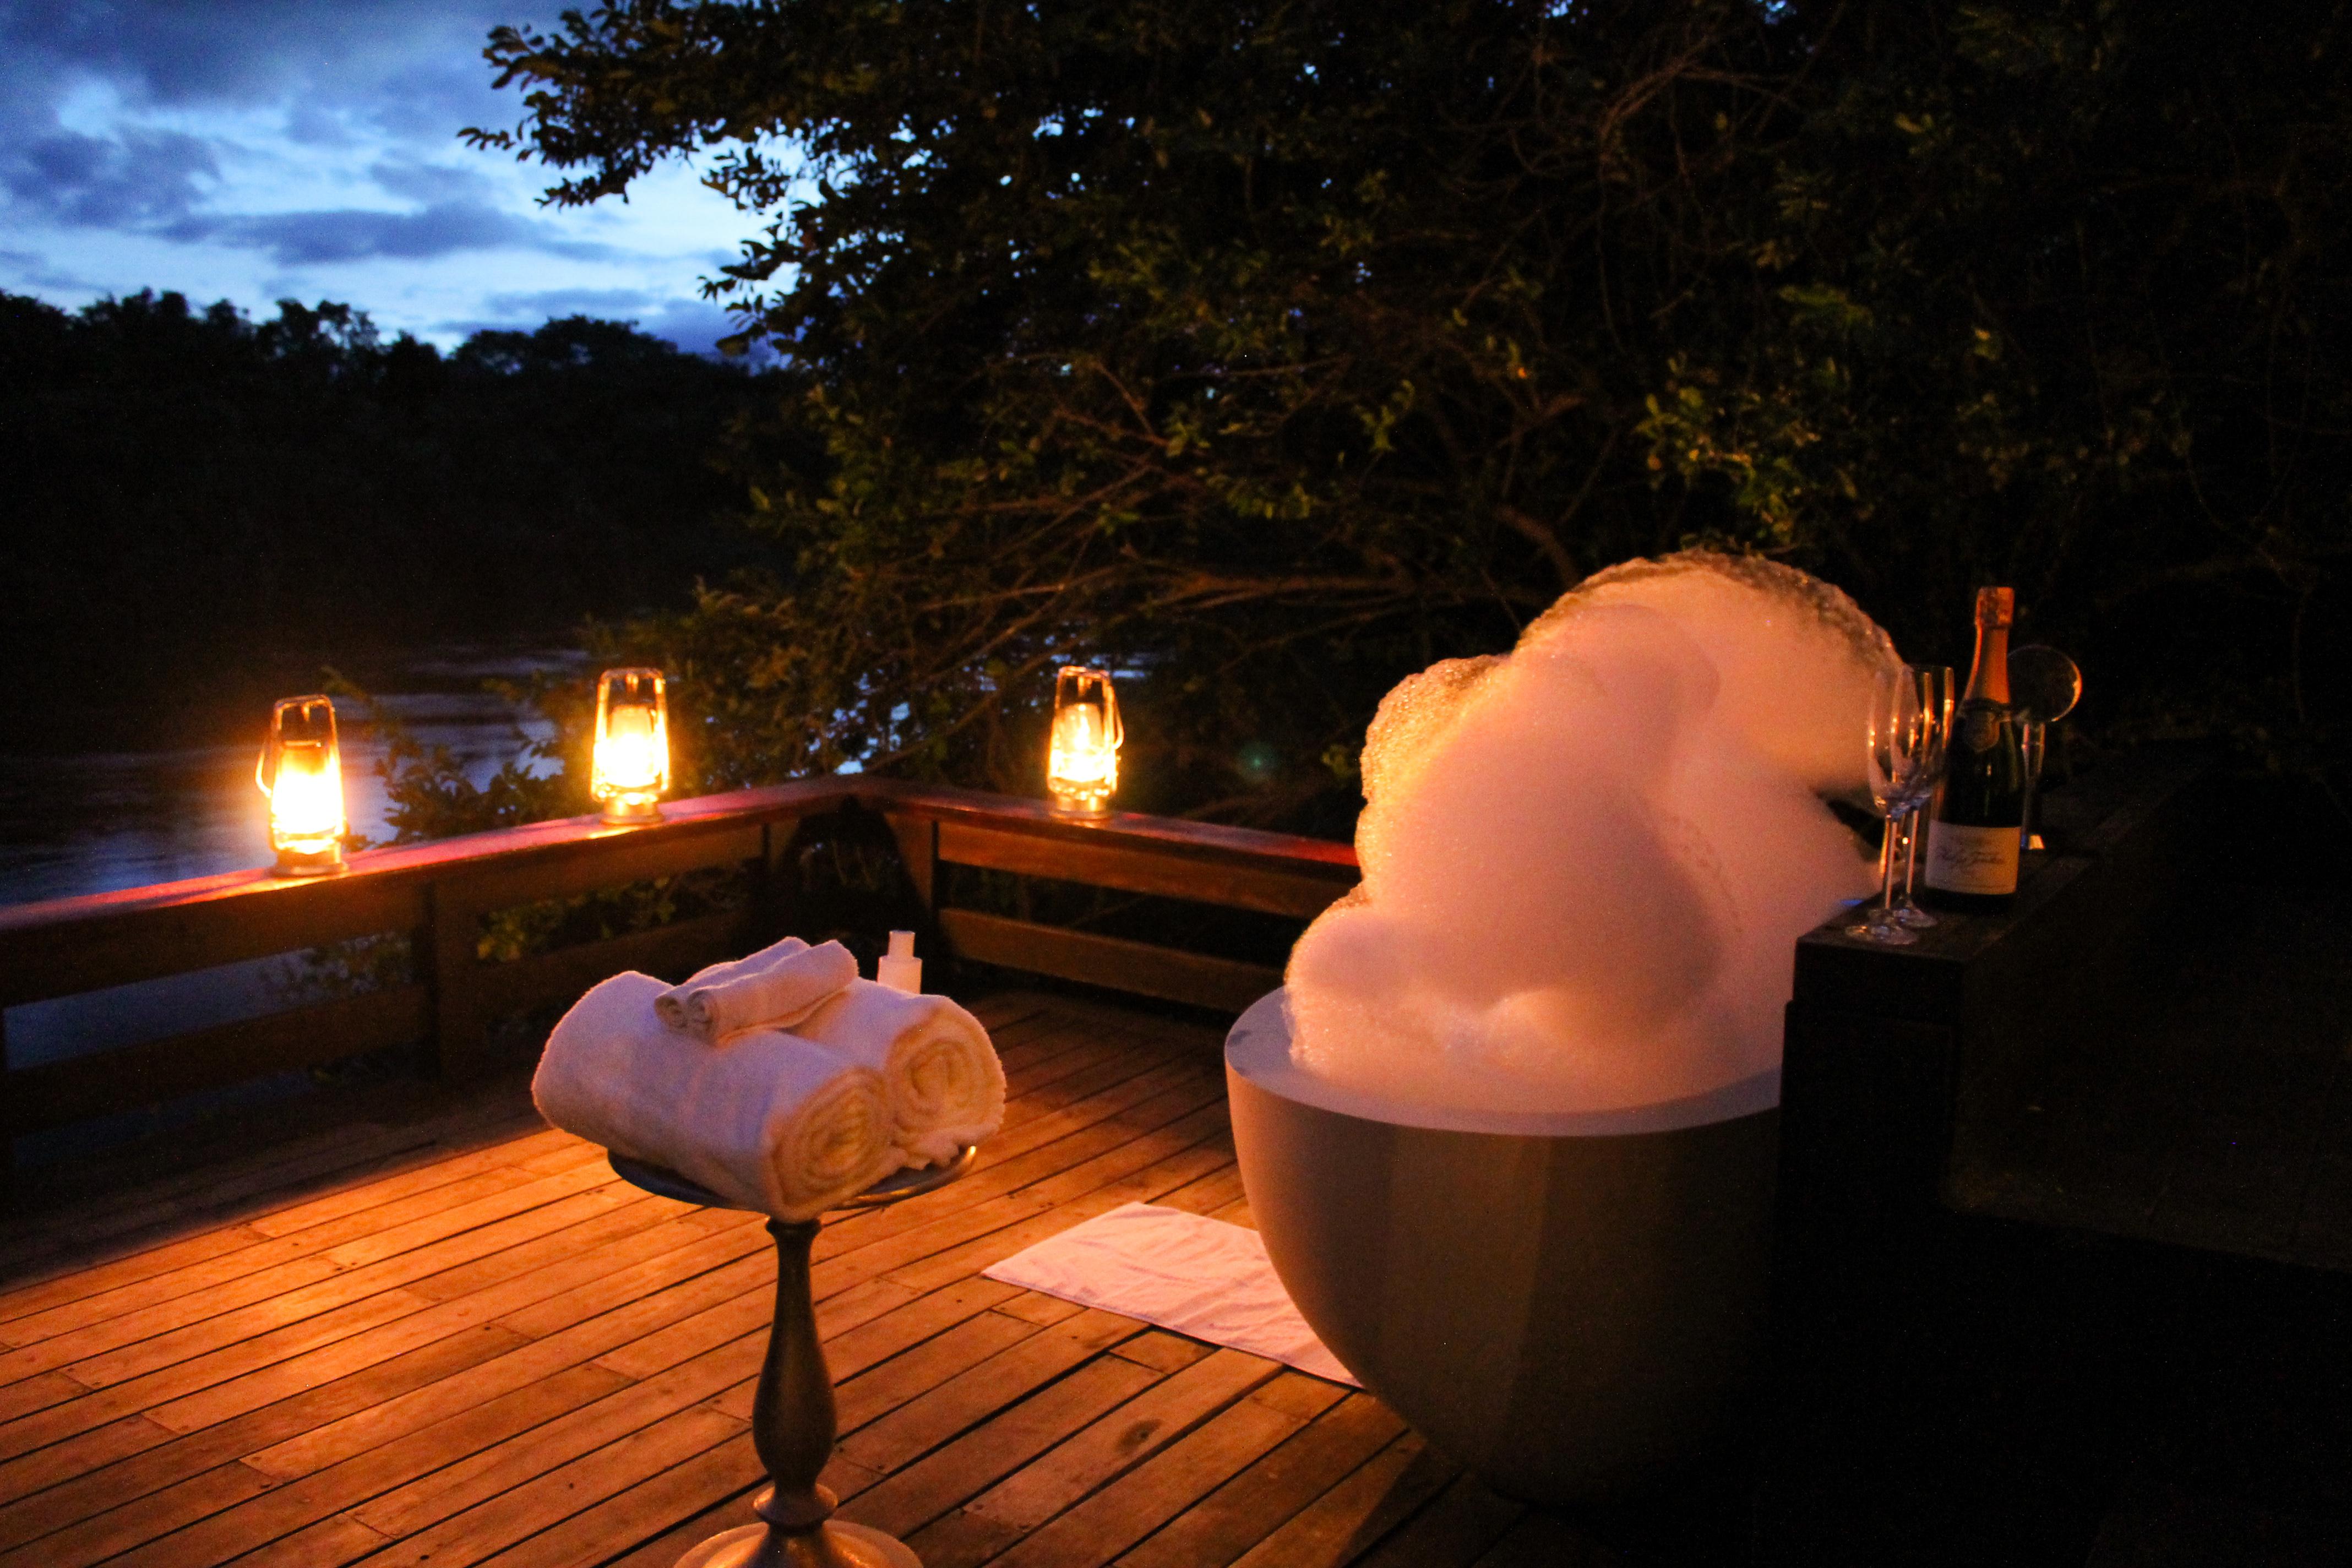 bath-royalchundu-zambia-lustforthesublime